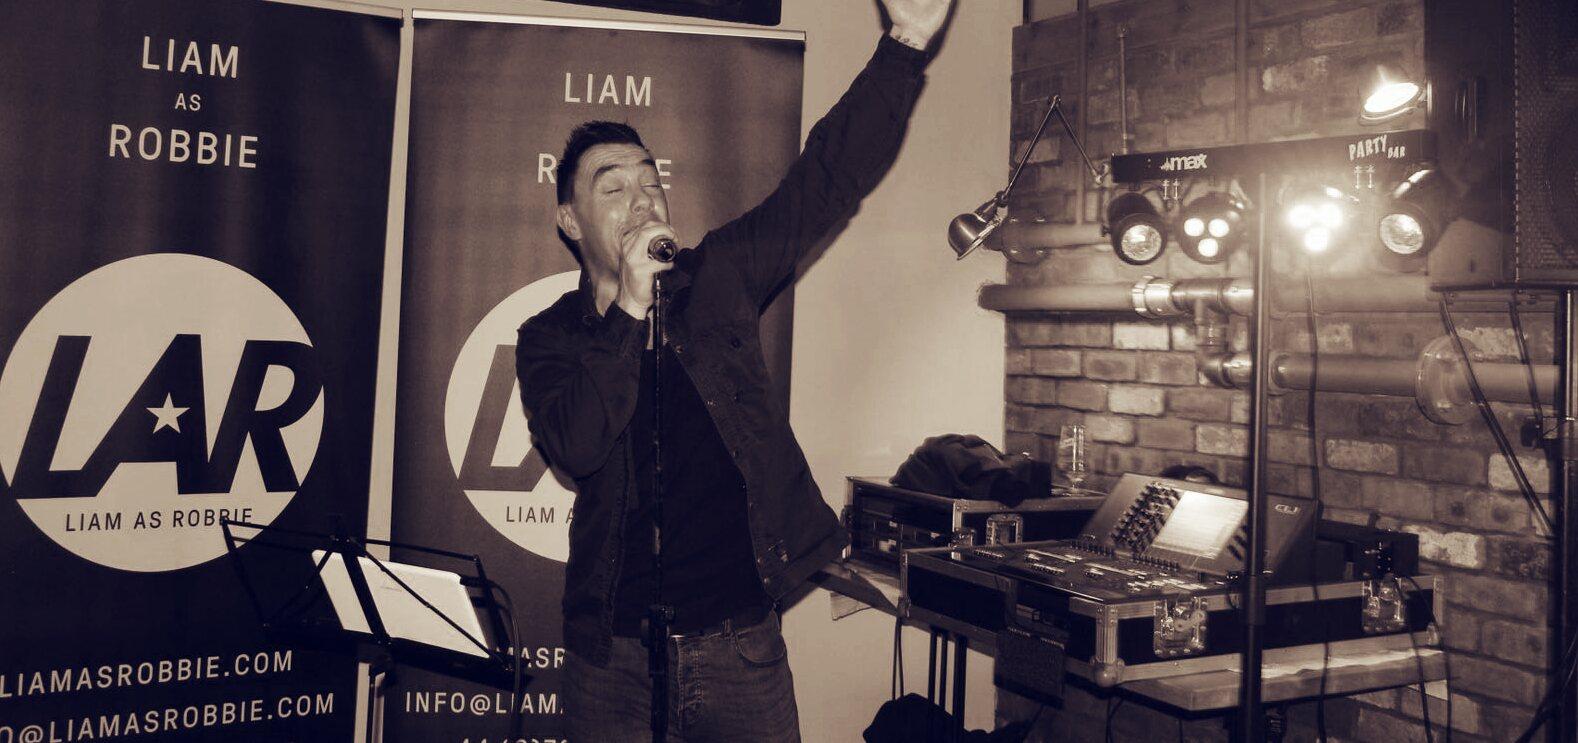 Liam as Robbie4 xsp.co.uk.jpg